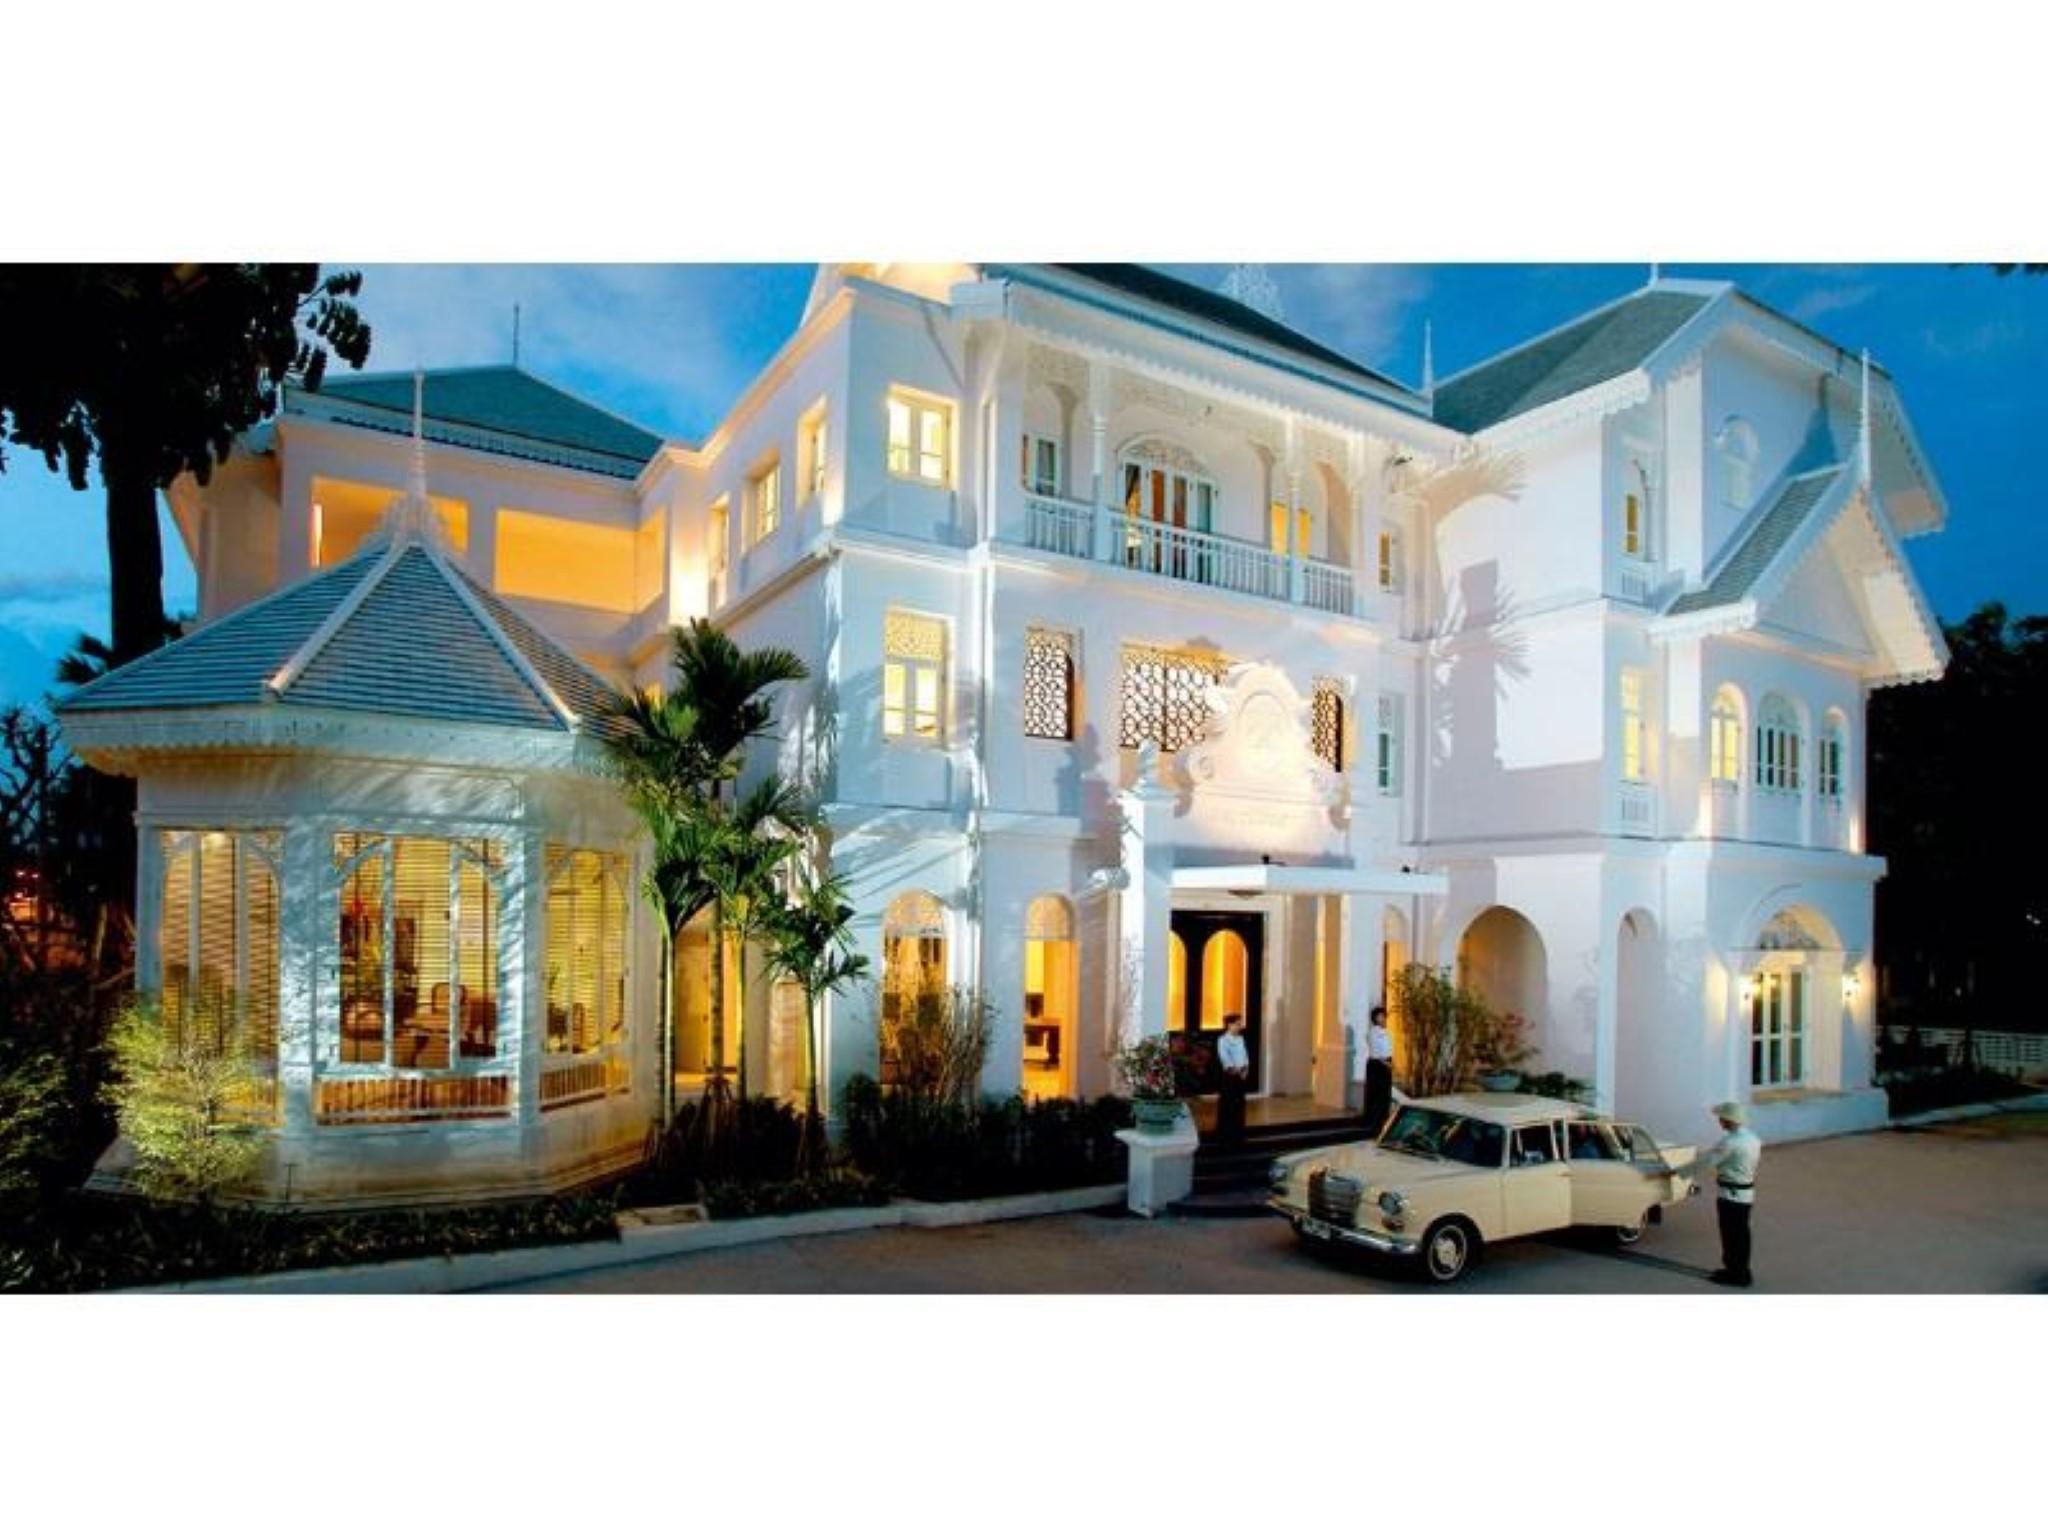 Ping Nakara Boutique Hotel and Spa ปิง นครา บูติค โฮเต็ล แอนด์ สปา